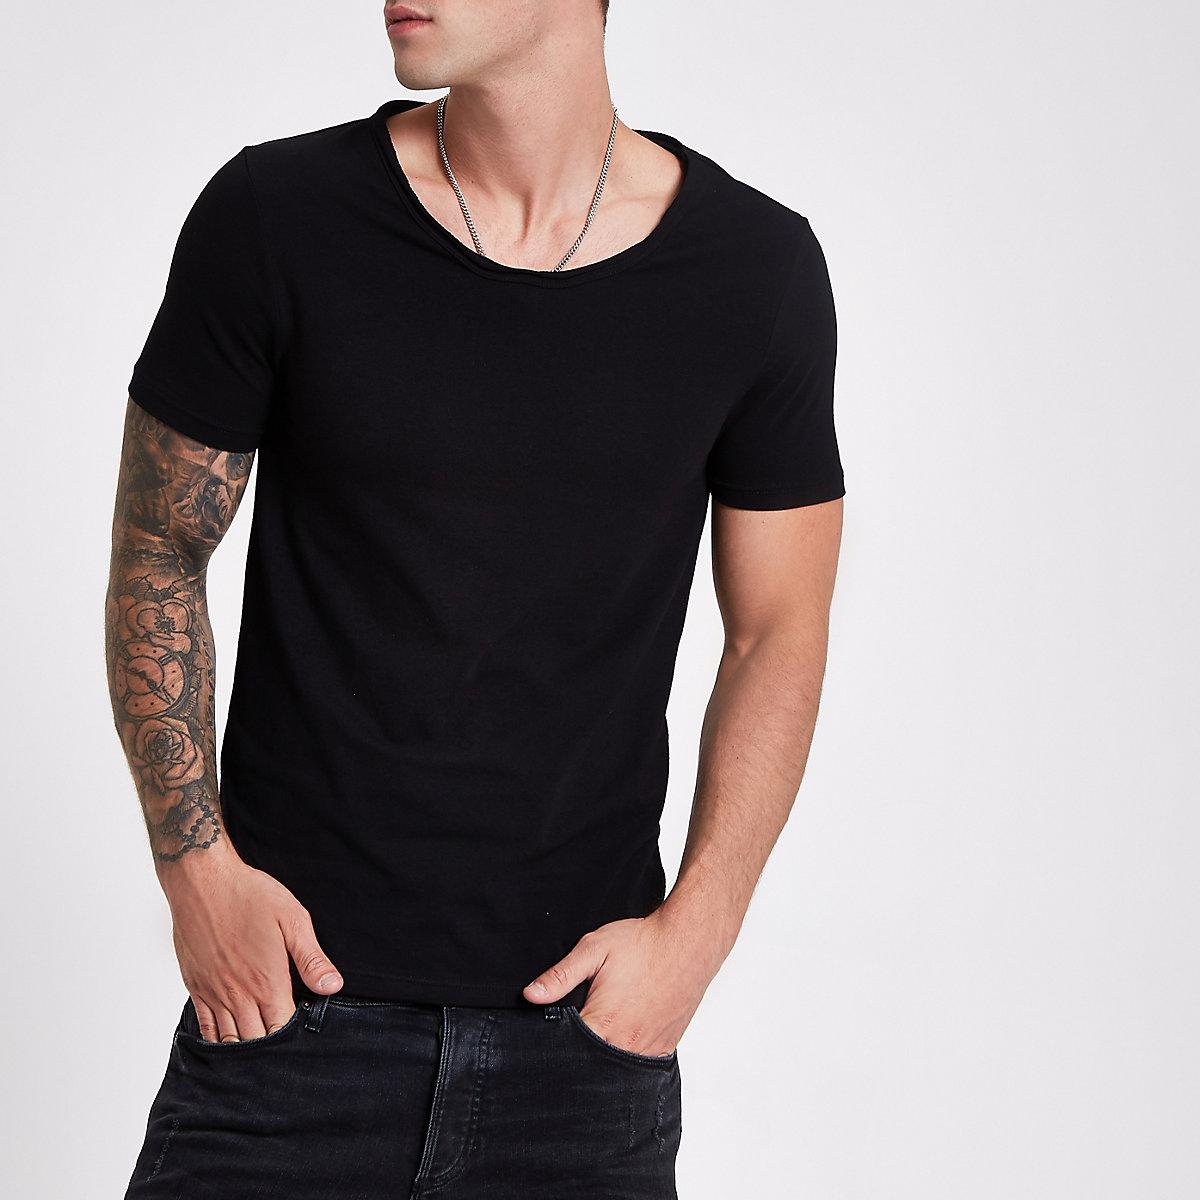 Black muscle fit scoop neck T-shirt